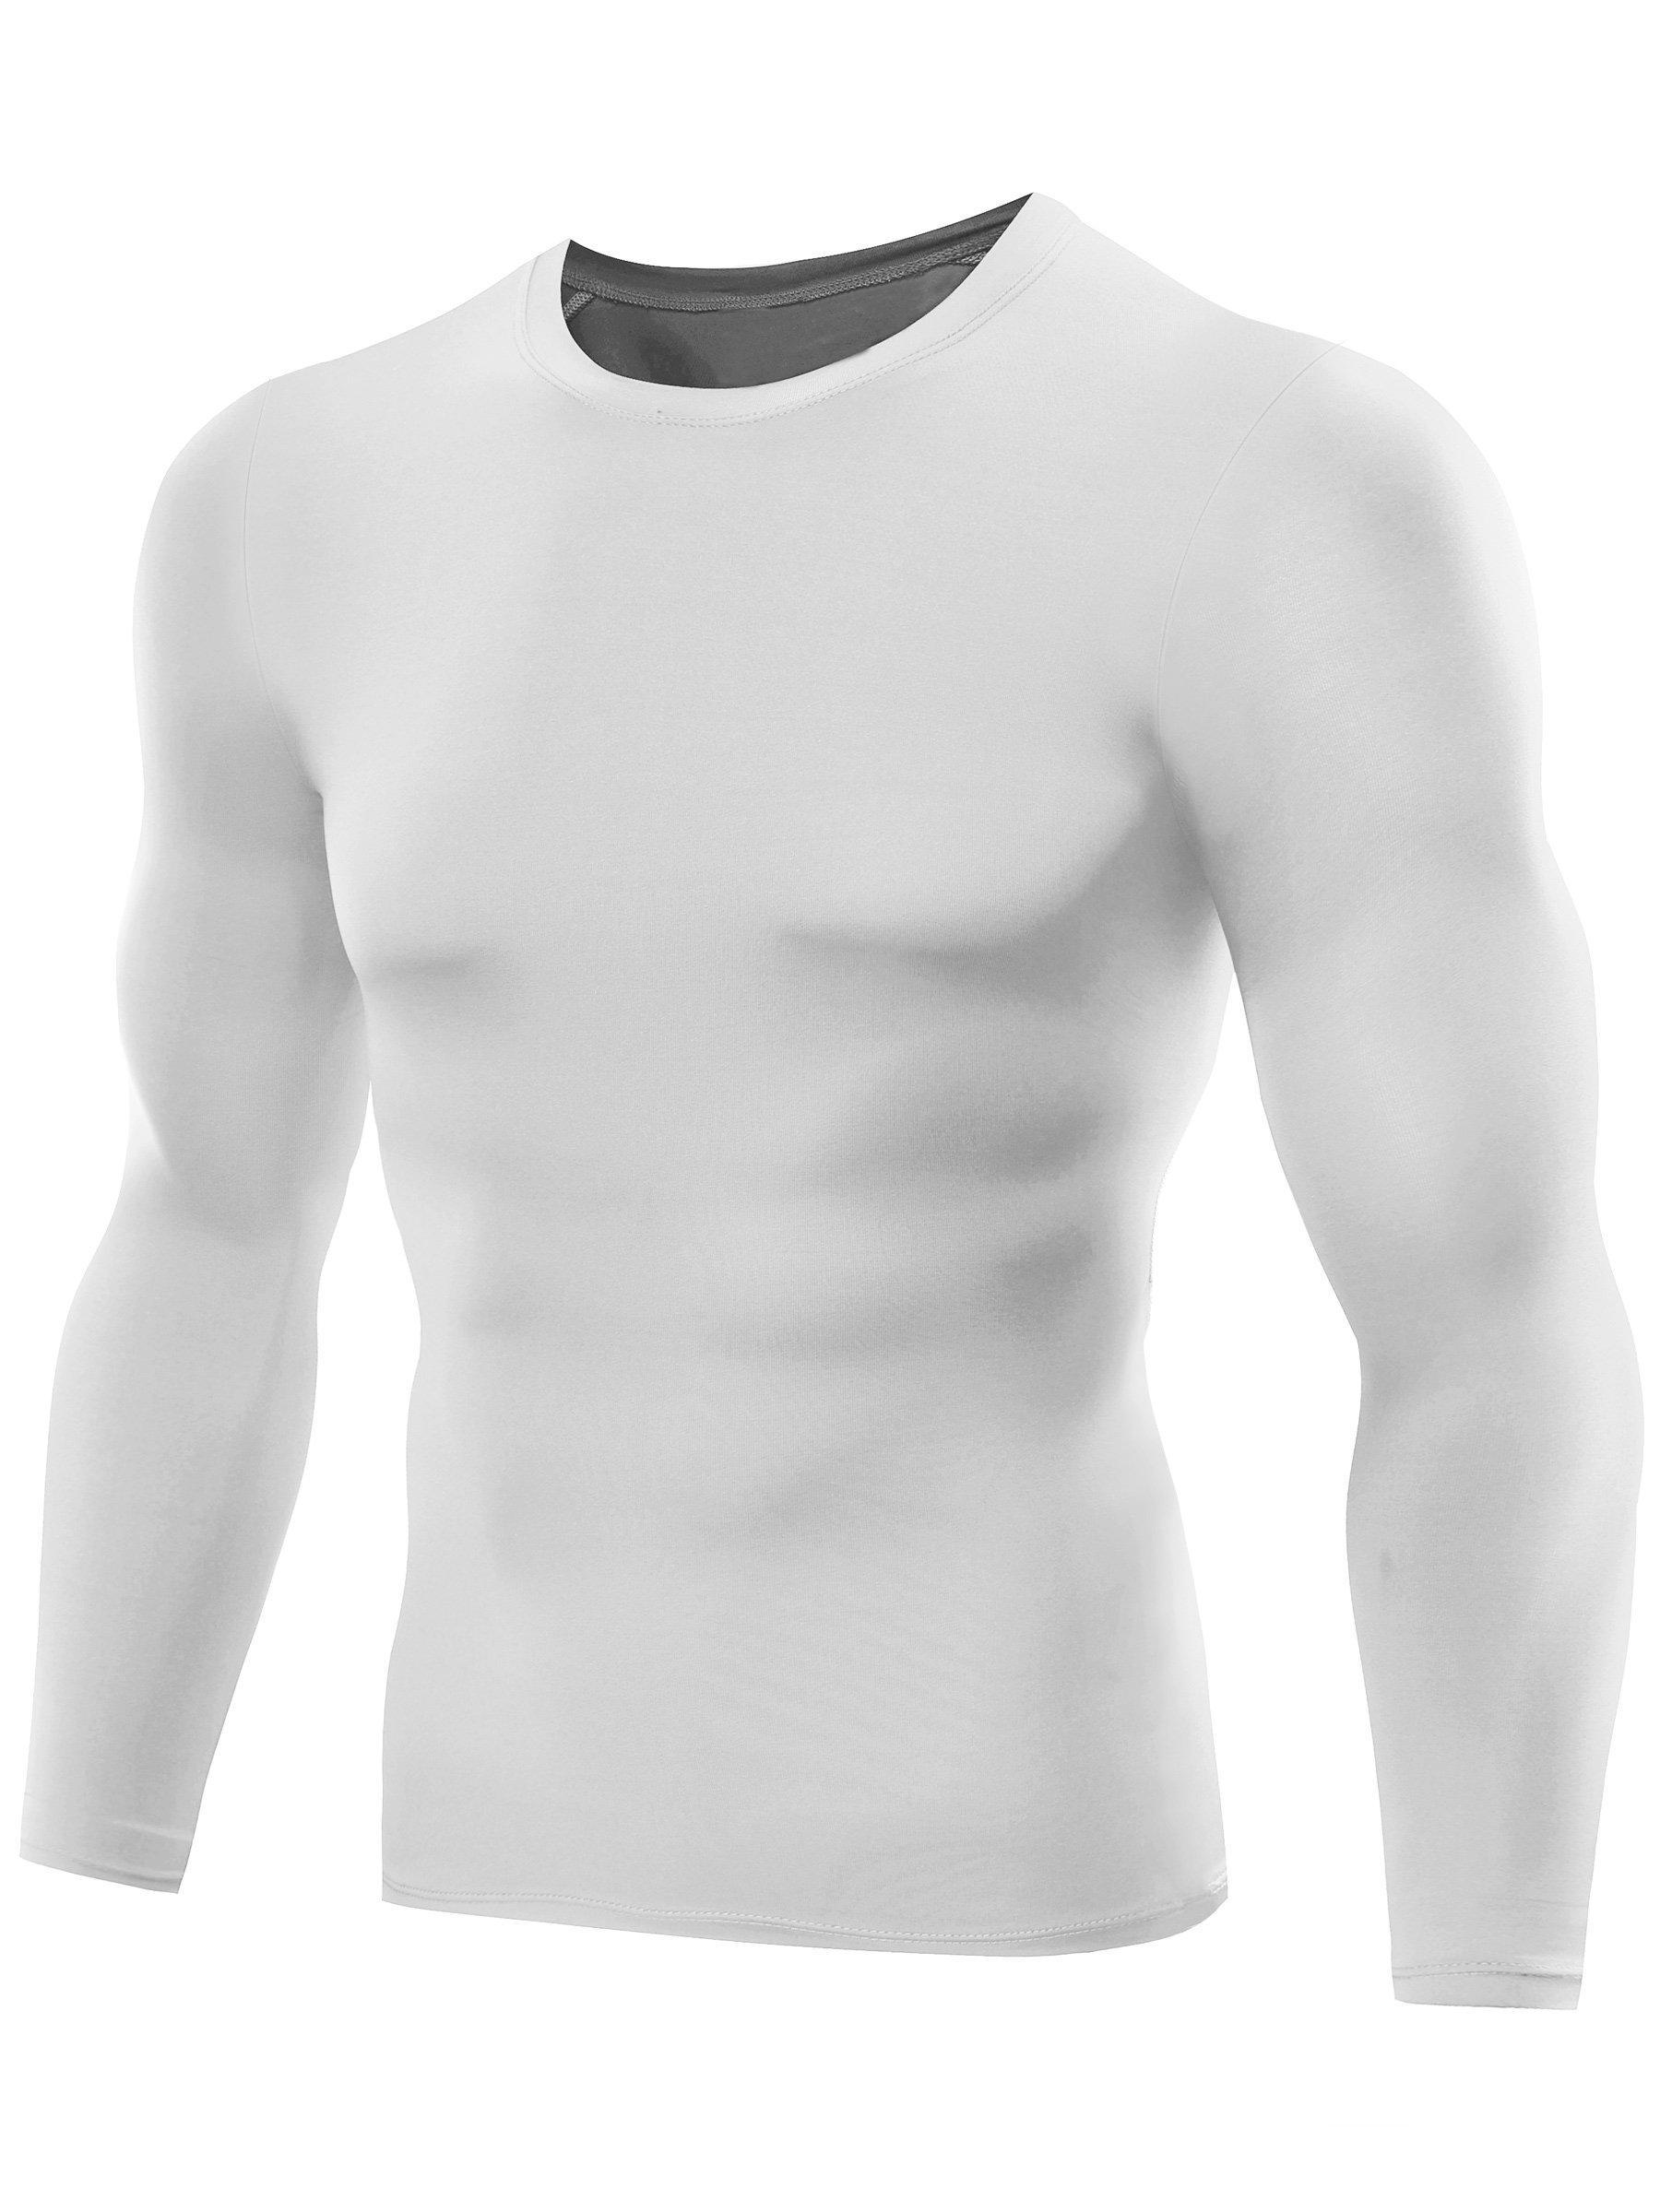 b58e8f534387 Neleus Men's Dry Fit Athletic Shirts 3 Pack,5021,White,US L,EU XL -  DT5021W+W+WXL#3 < Compression Tops < Sports & Outdoors - tibs